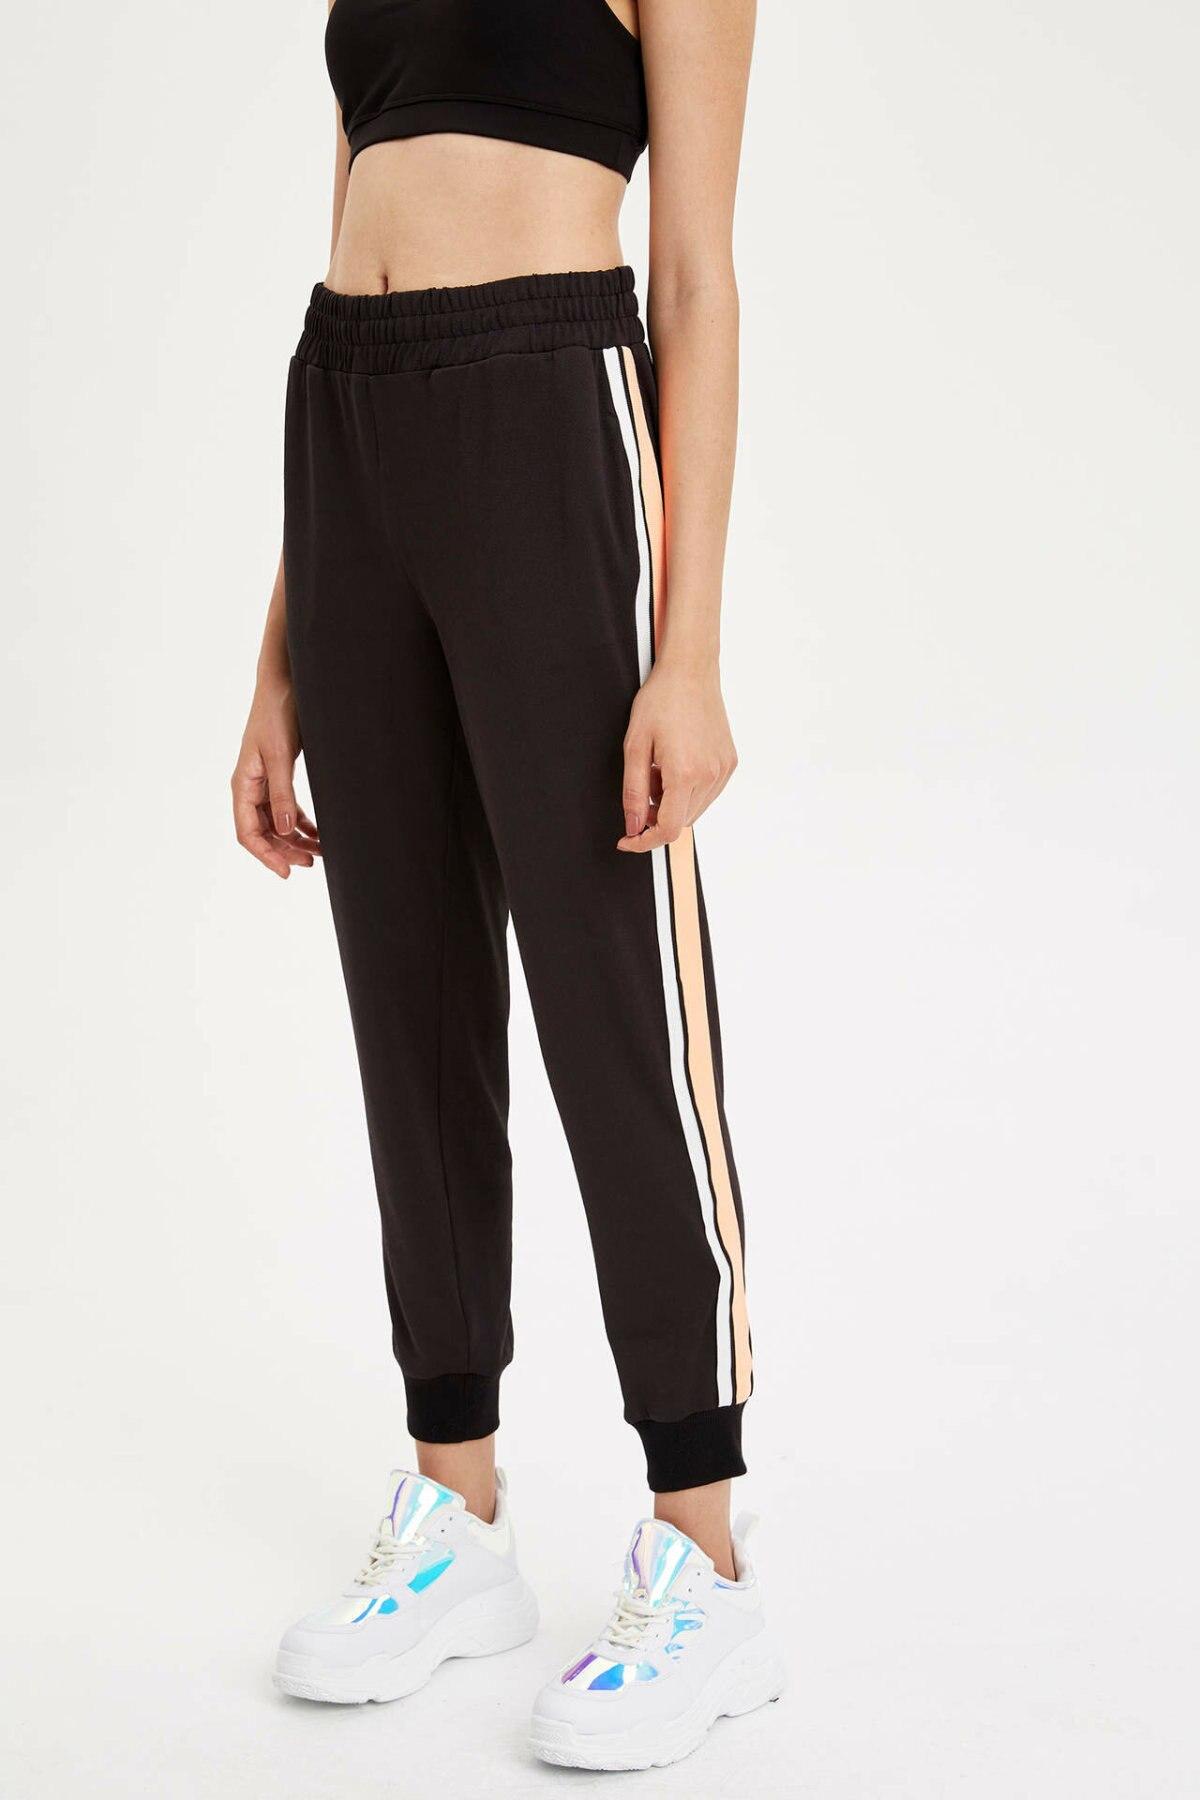 DeFacto Woman Summer Black Casual Legging Pants Women Elastic White Striped Bottoms Female Knitted Trousers-L5520AZ19HS